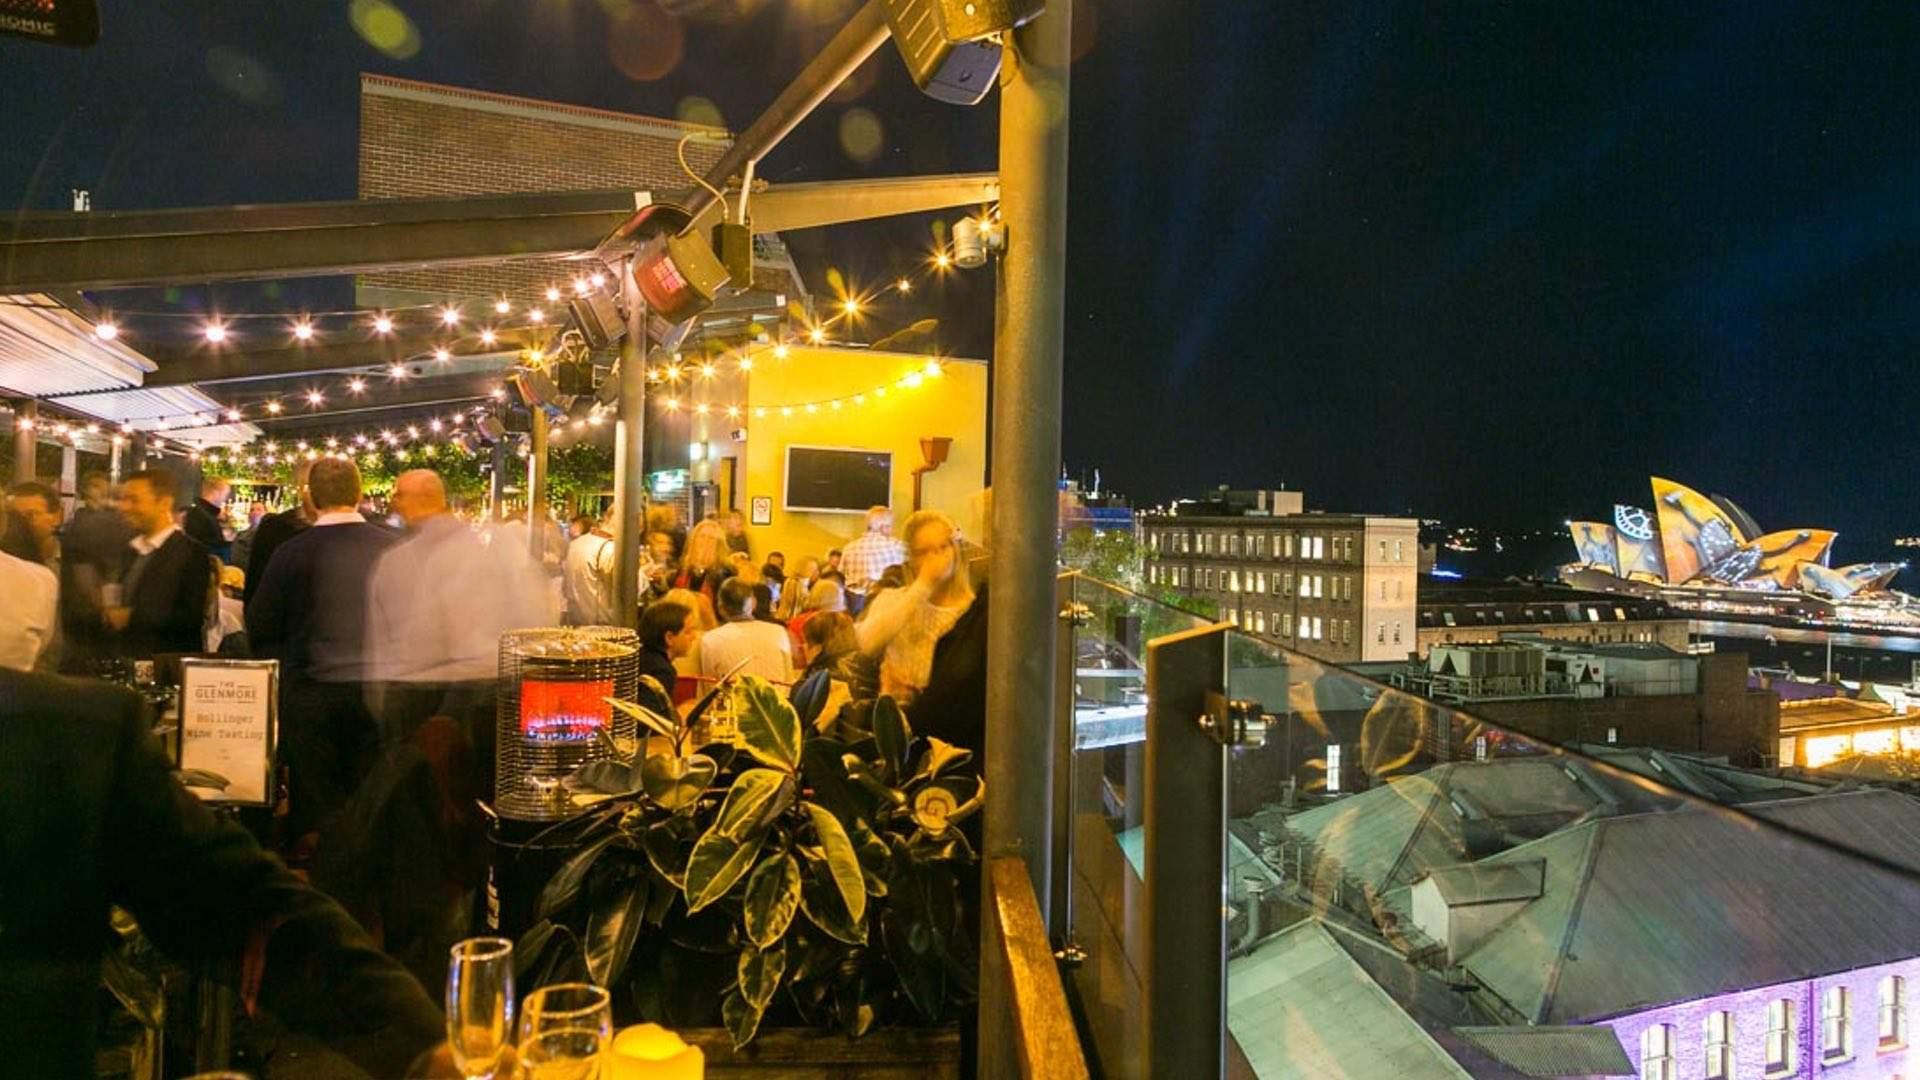 Sydney's Best Dining Spots for Vivid Views